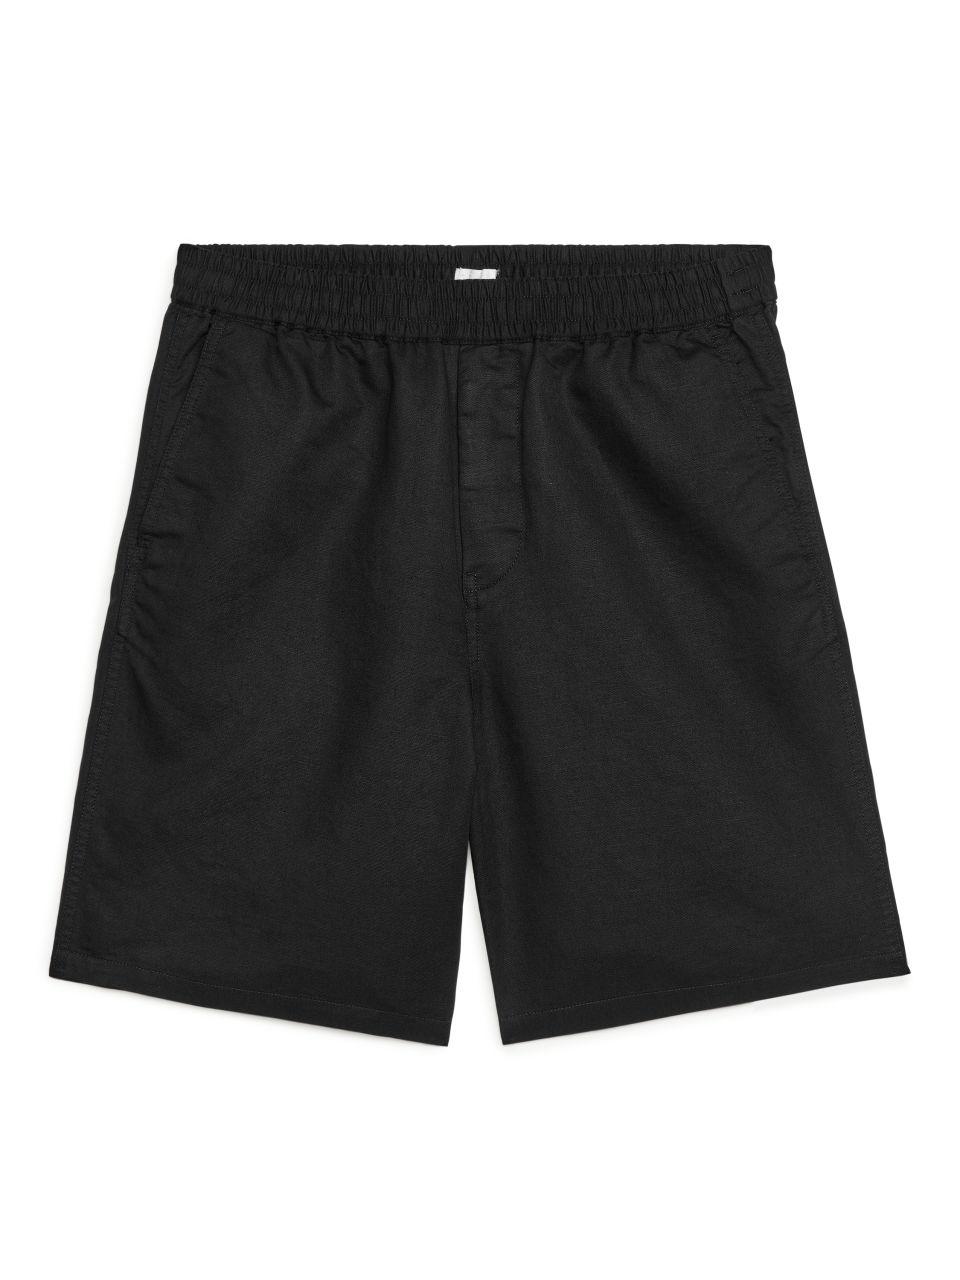 Cotton-Linen Drawstring Shorts - Black